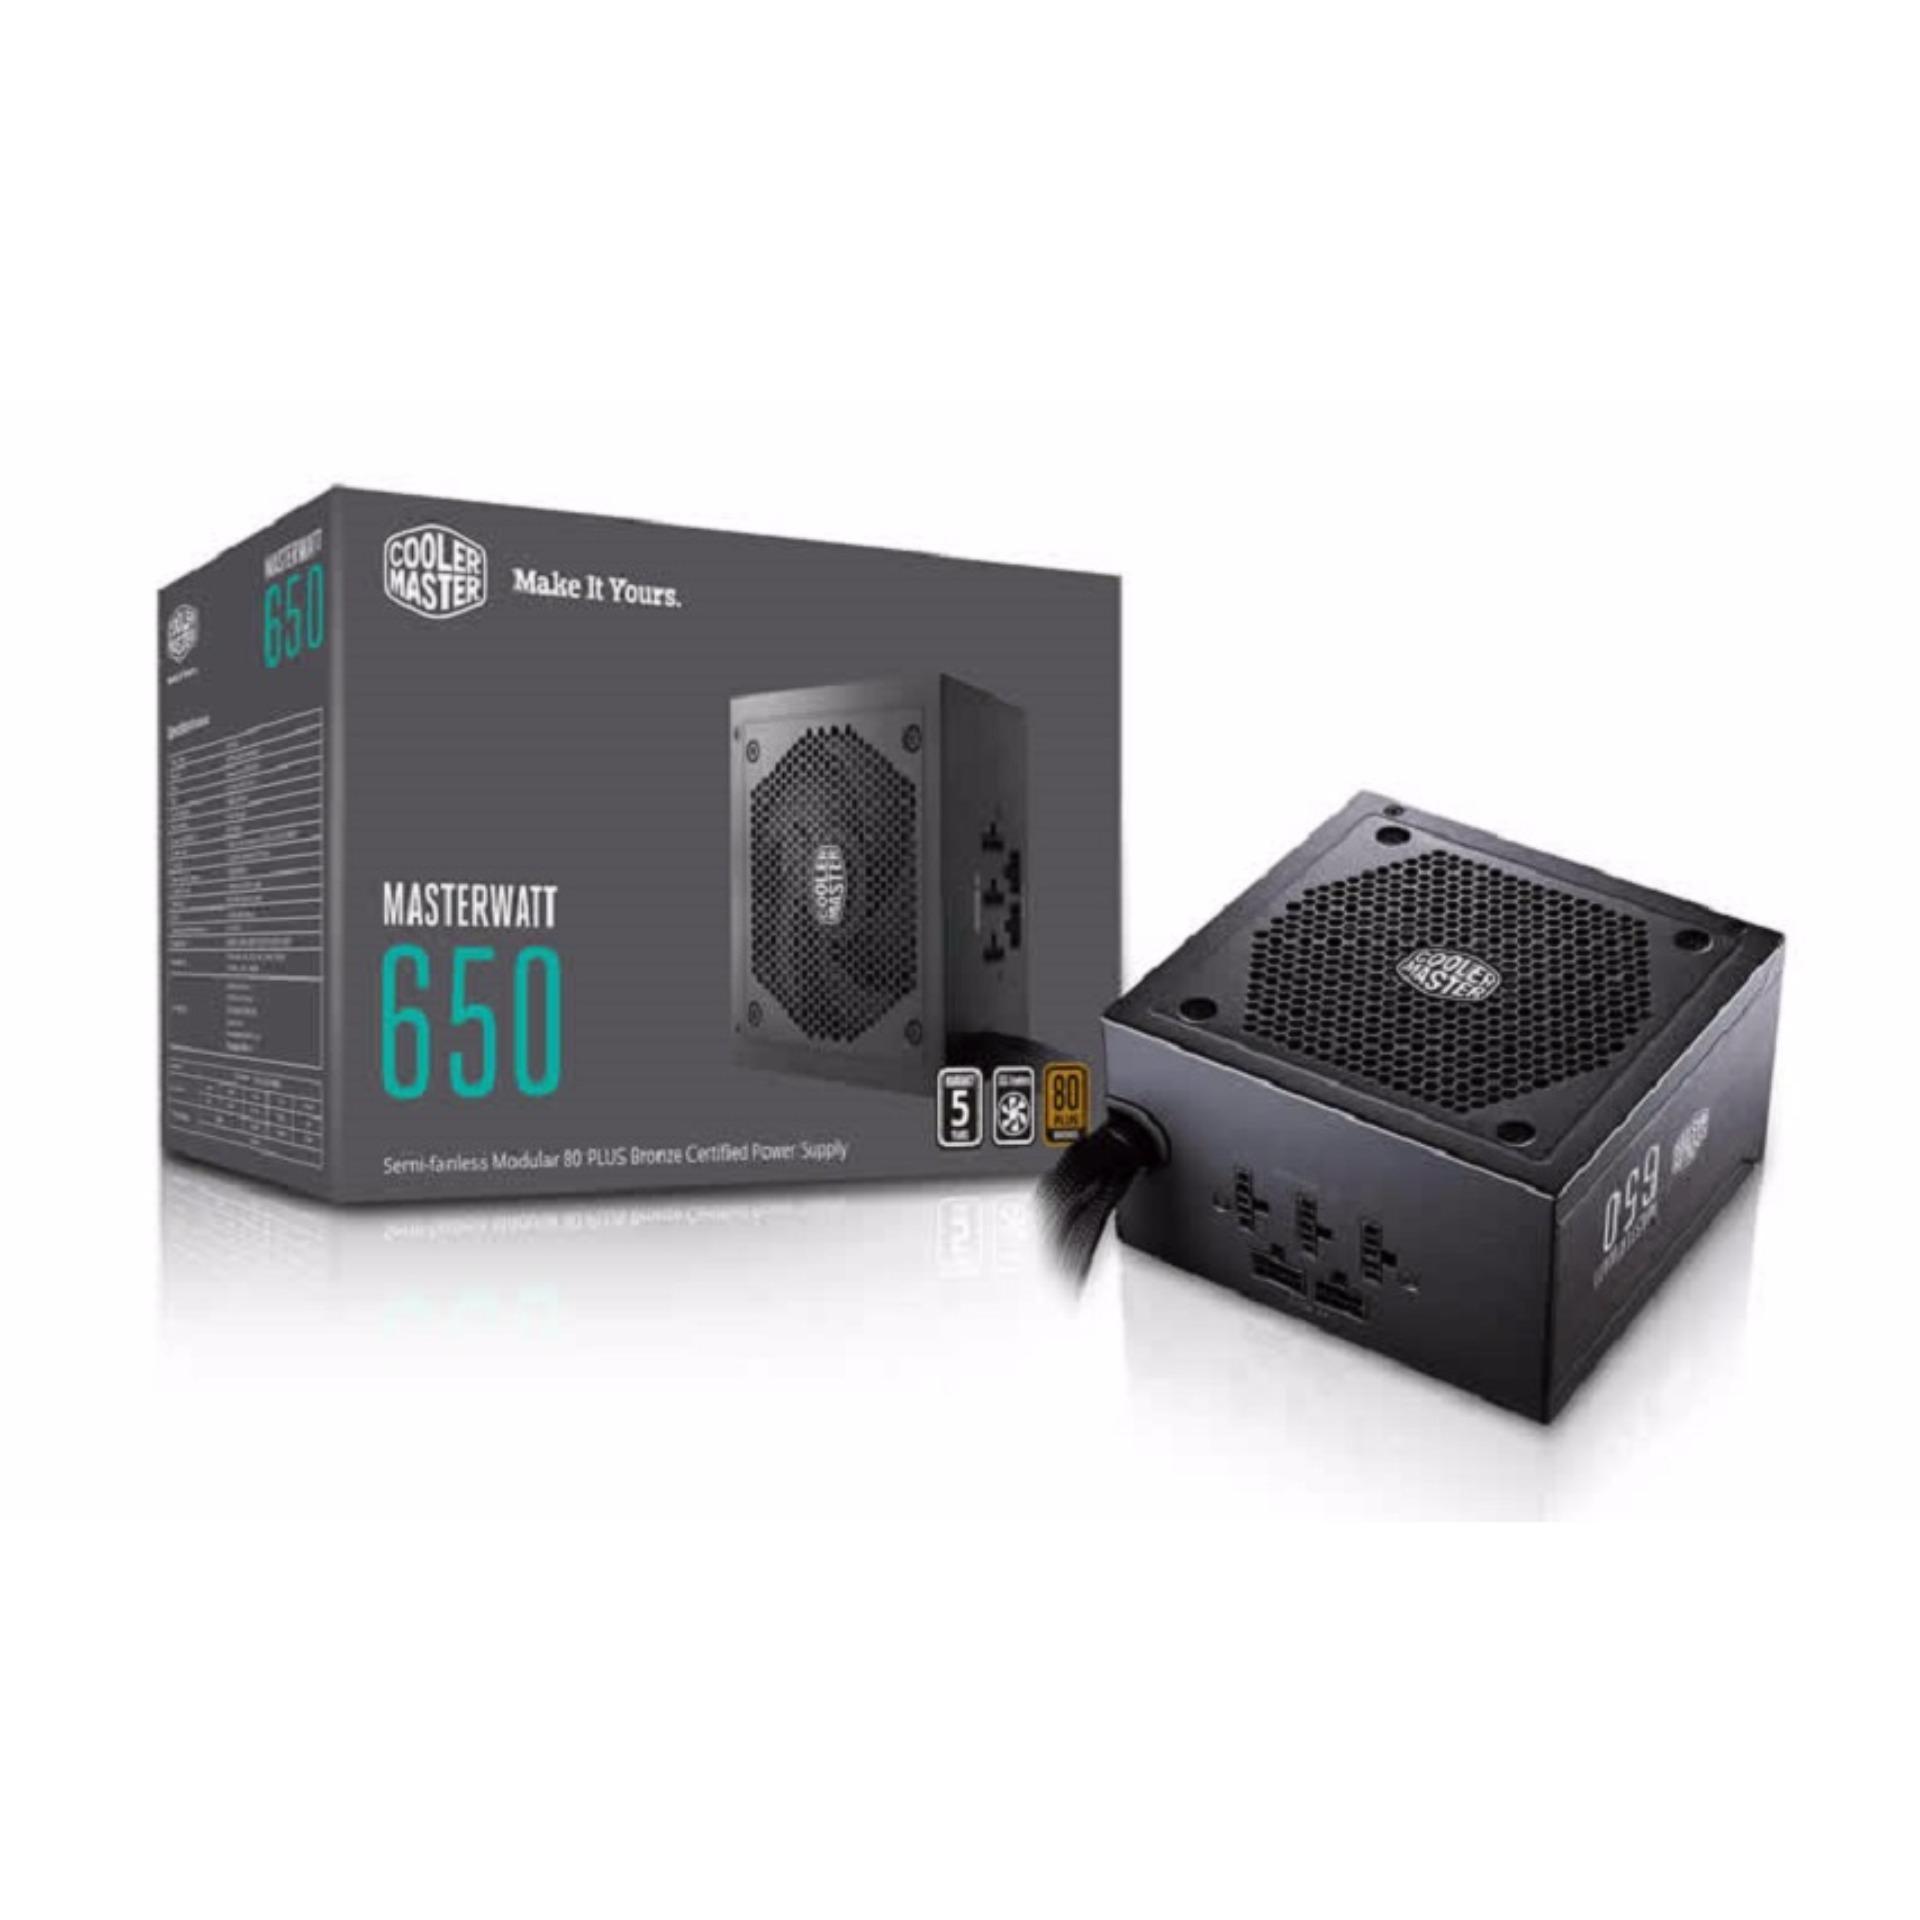 Cooler Master Power Supply Units Singapore Digital Alliance Psu Gaming 500 Watt 80 Bronze Masterwatt 650 Semi Fanless Modular